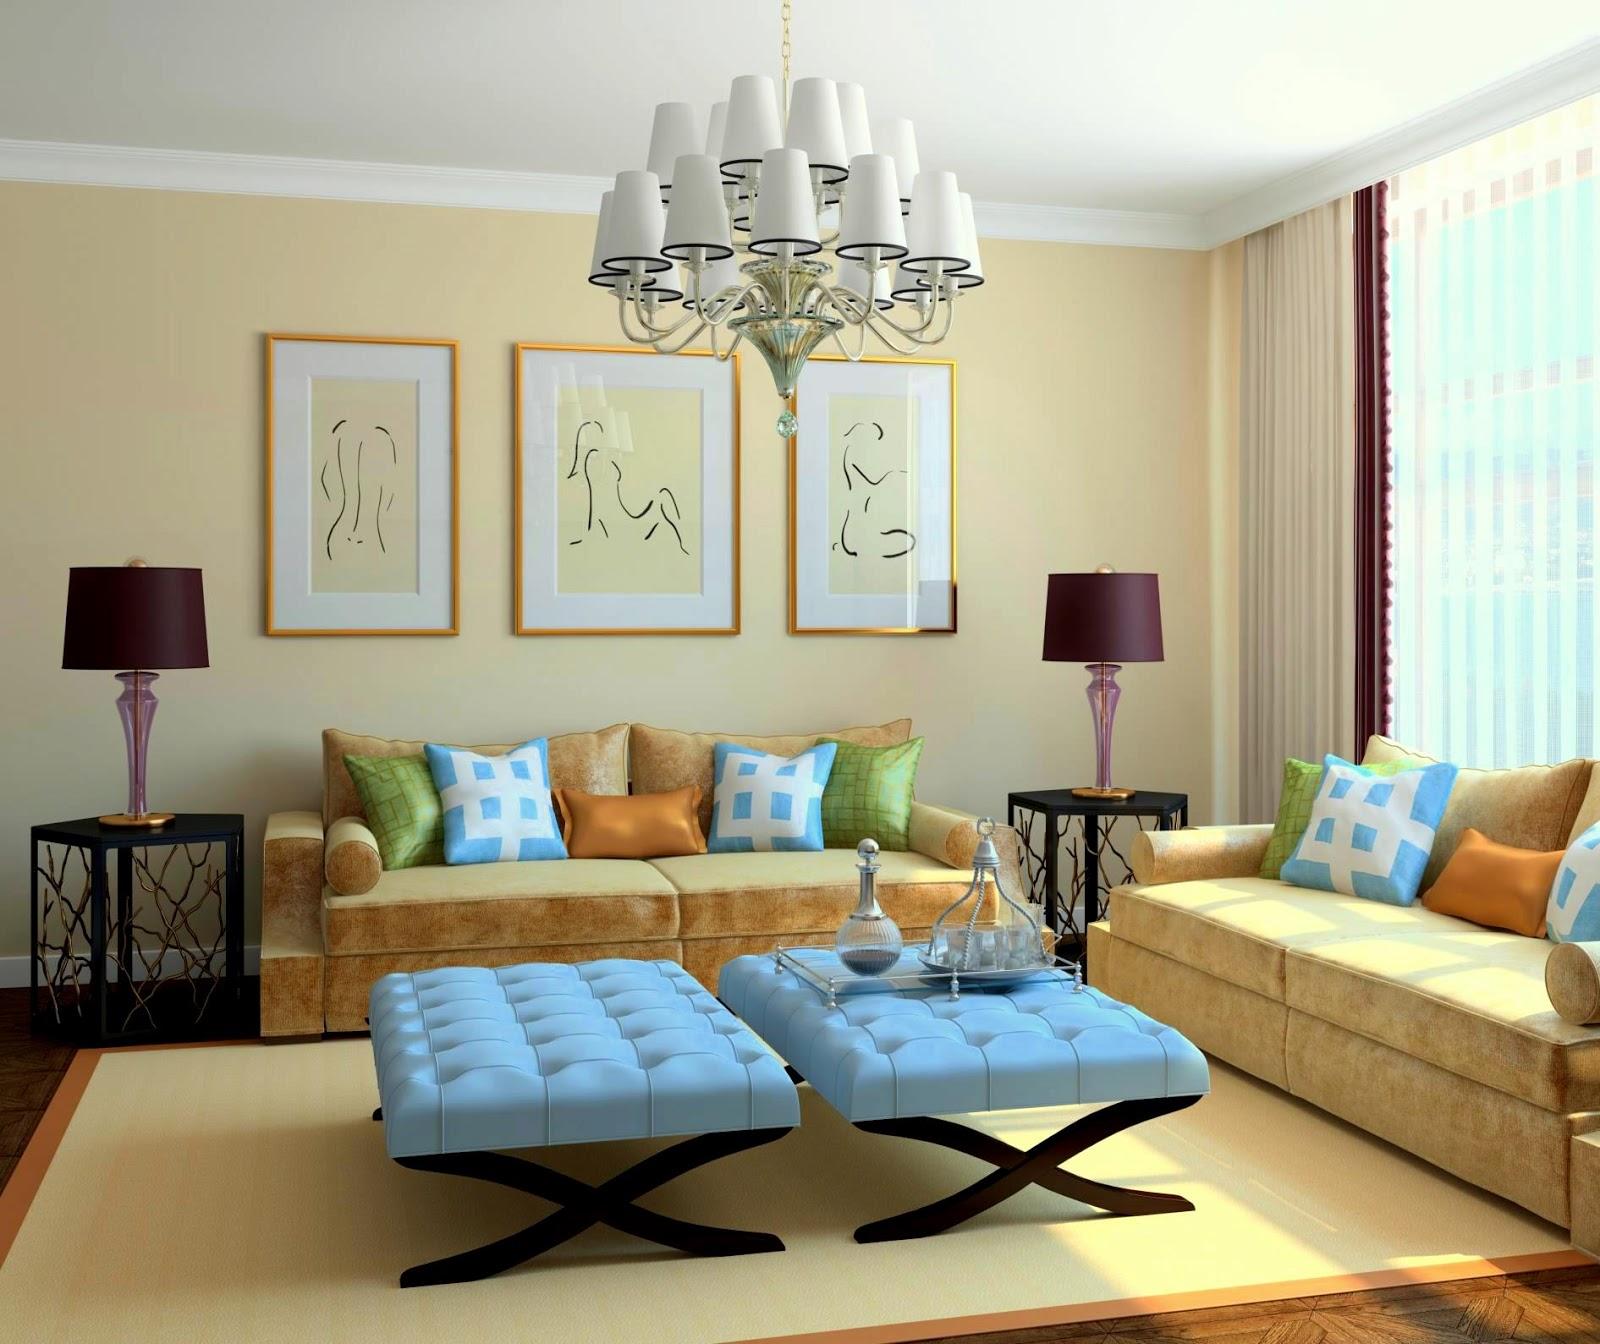 Koleksi Idea Dekorasi Ruang Tamu Rumah Teres Setingkat Hiasmy